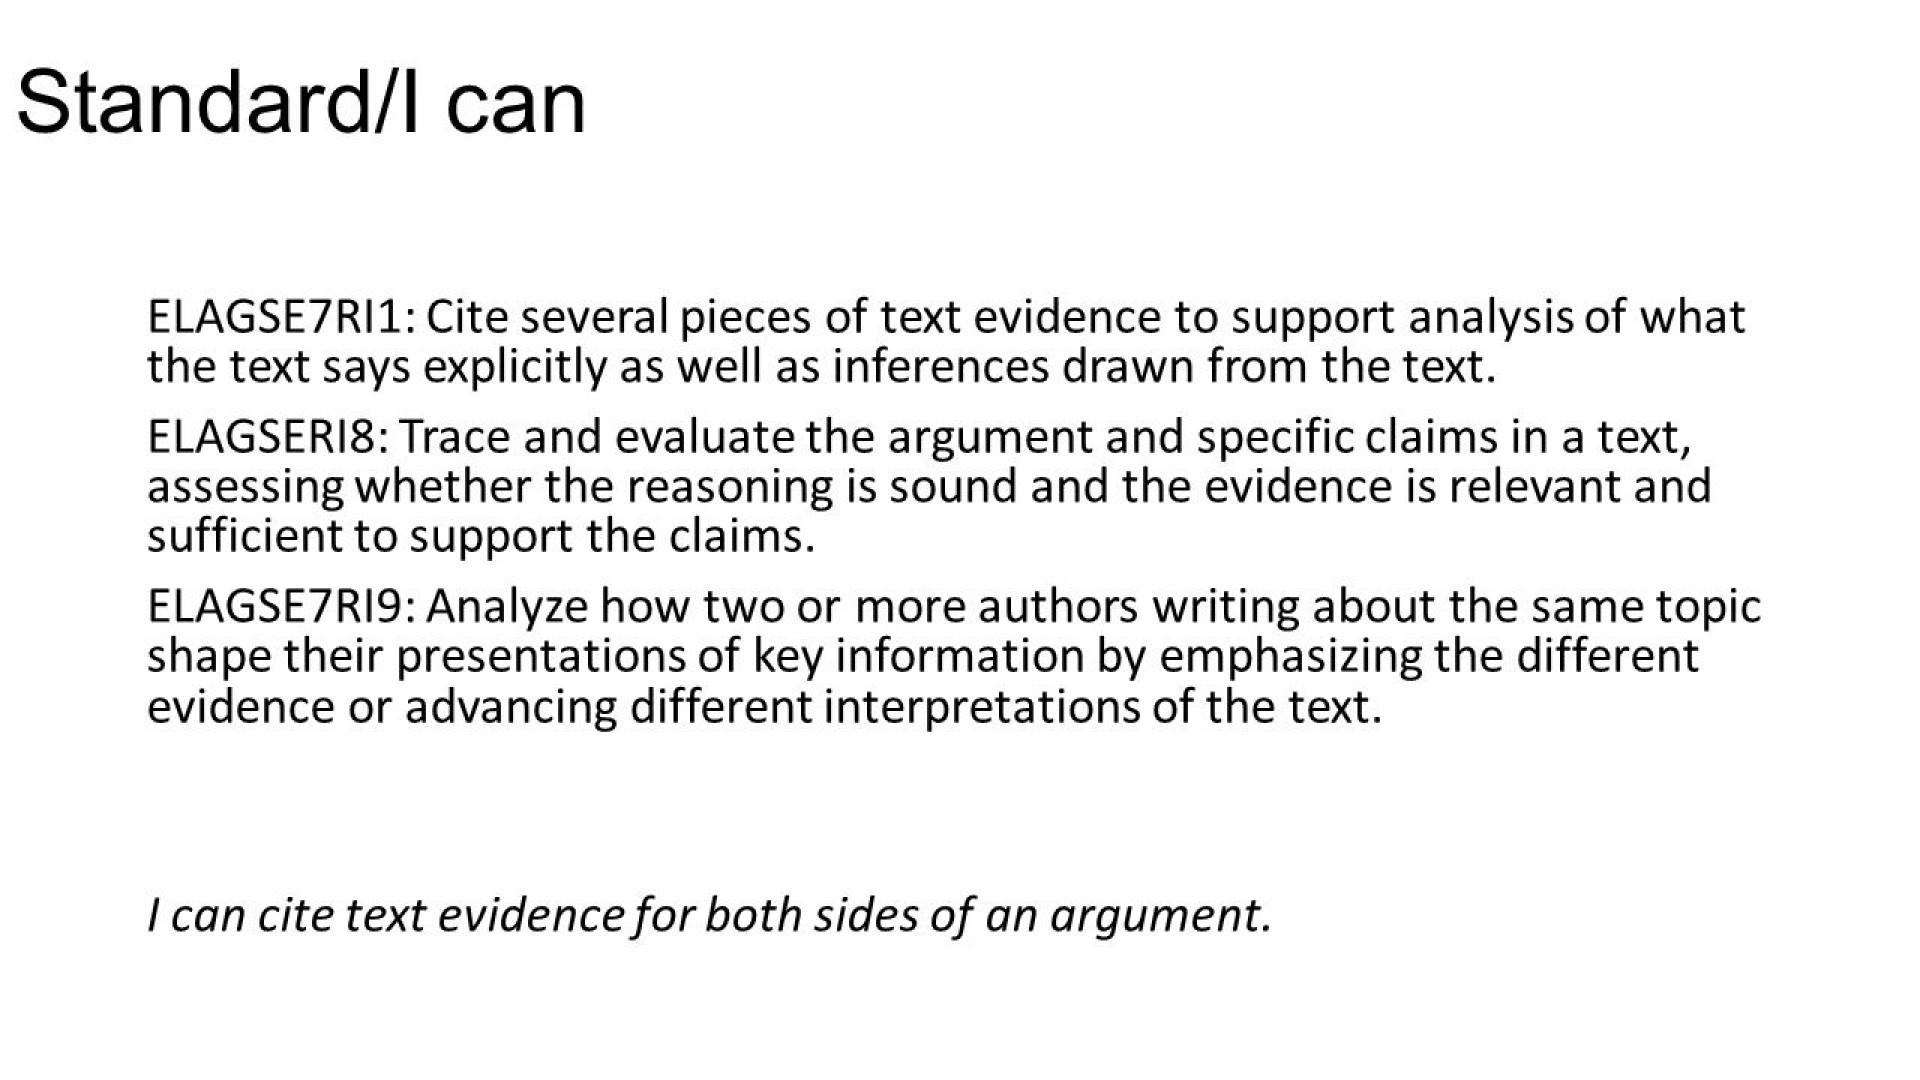 006 Essay Example Hook For Persuasive Hooks Of Good Argumentative Examples Sl Excellent Essays Narrative 1920